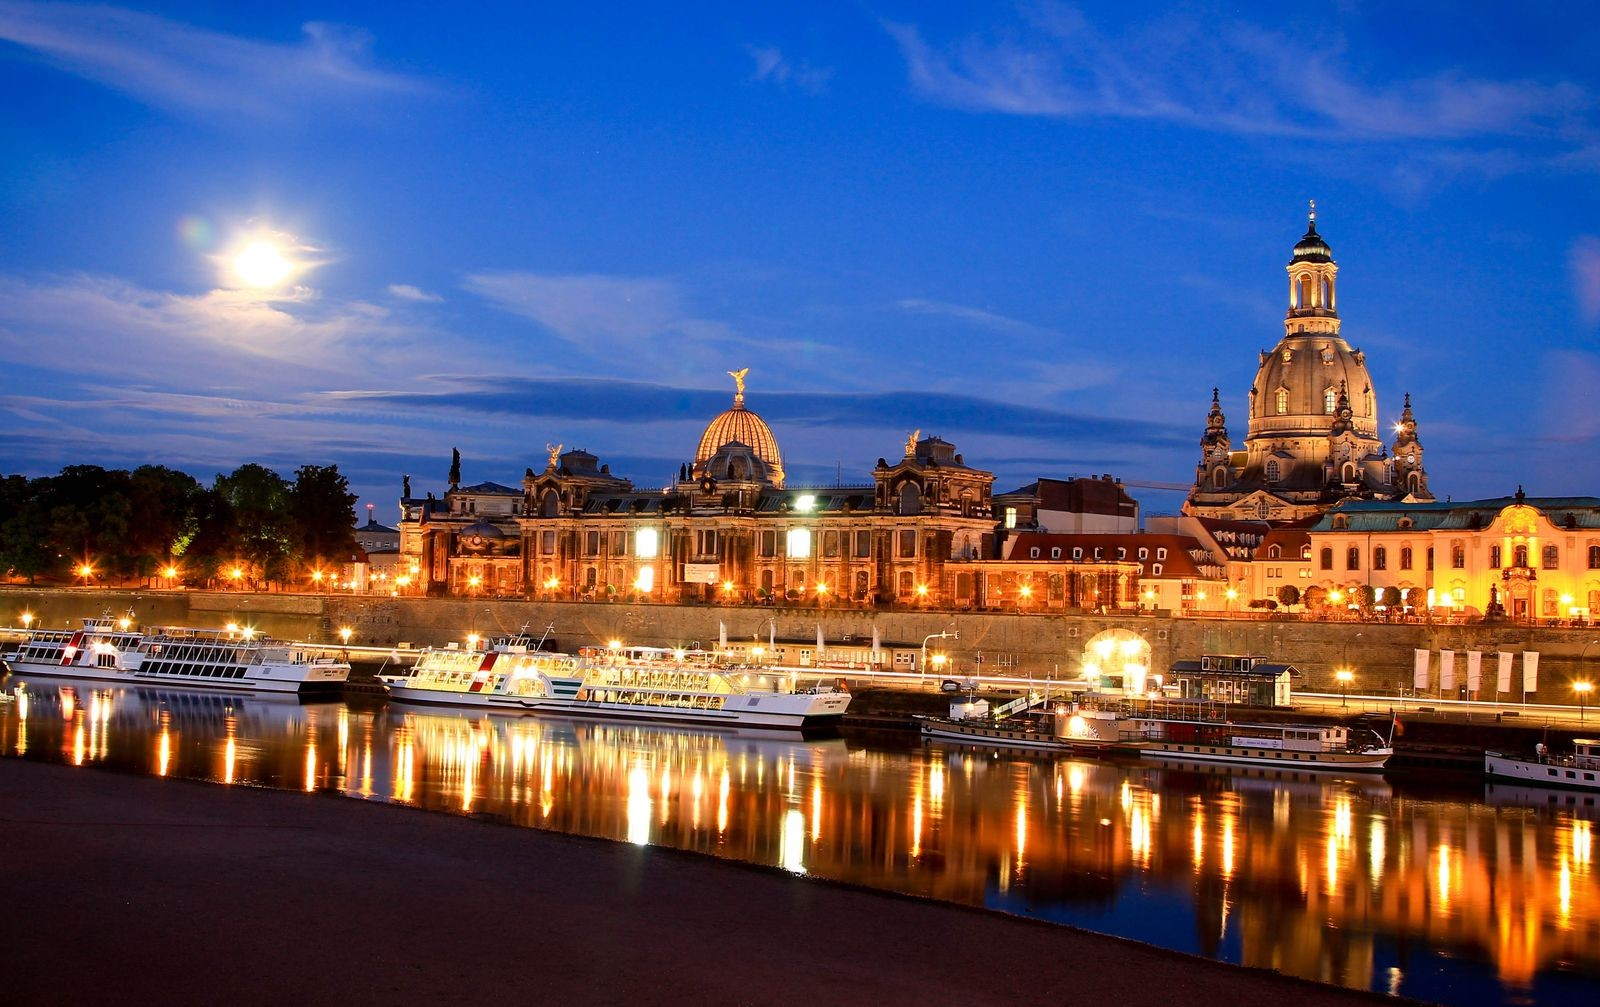 Dresda cosa vedere: Dresda, capitale della Sassonia in Germania, panorama notturno ©Foto Werner, Karol